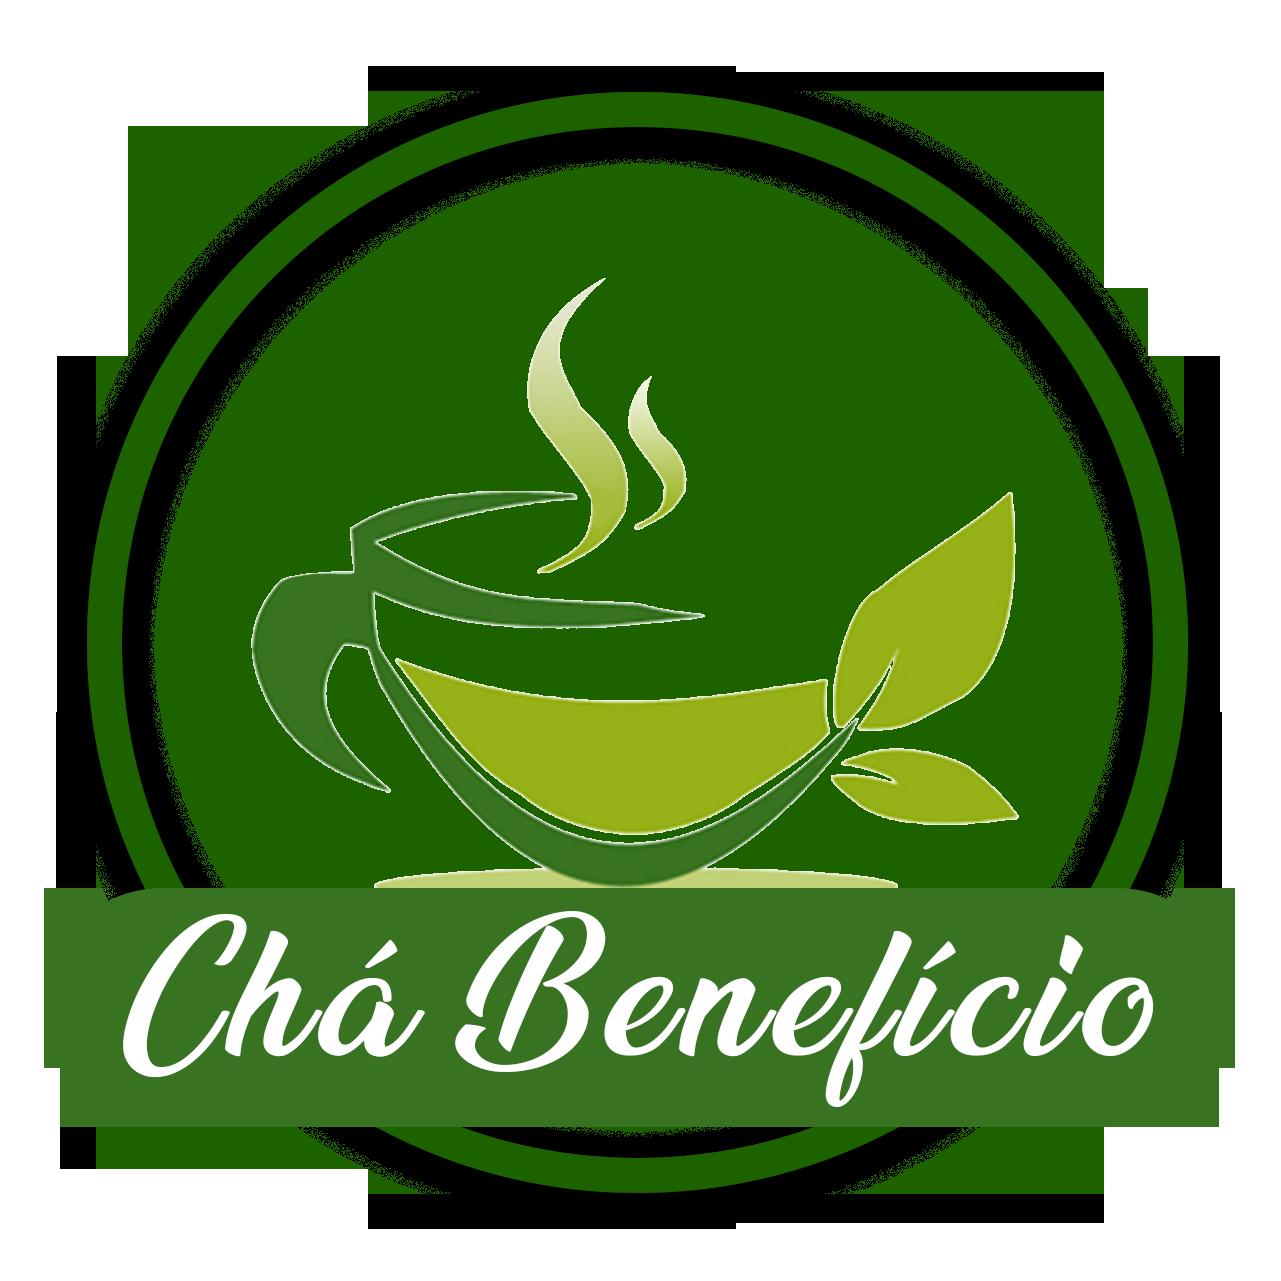 Benefícios dos Chás